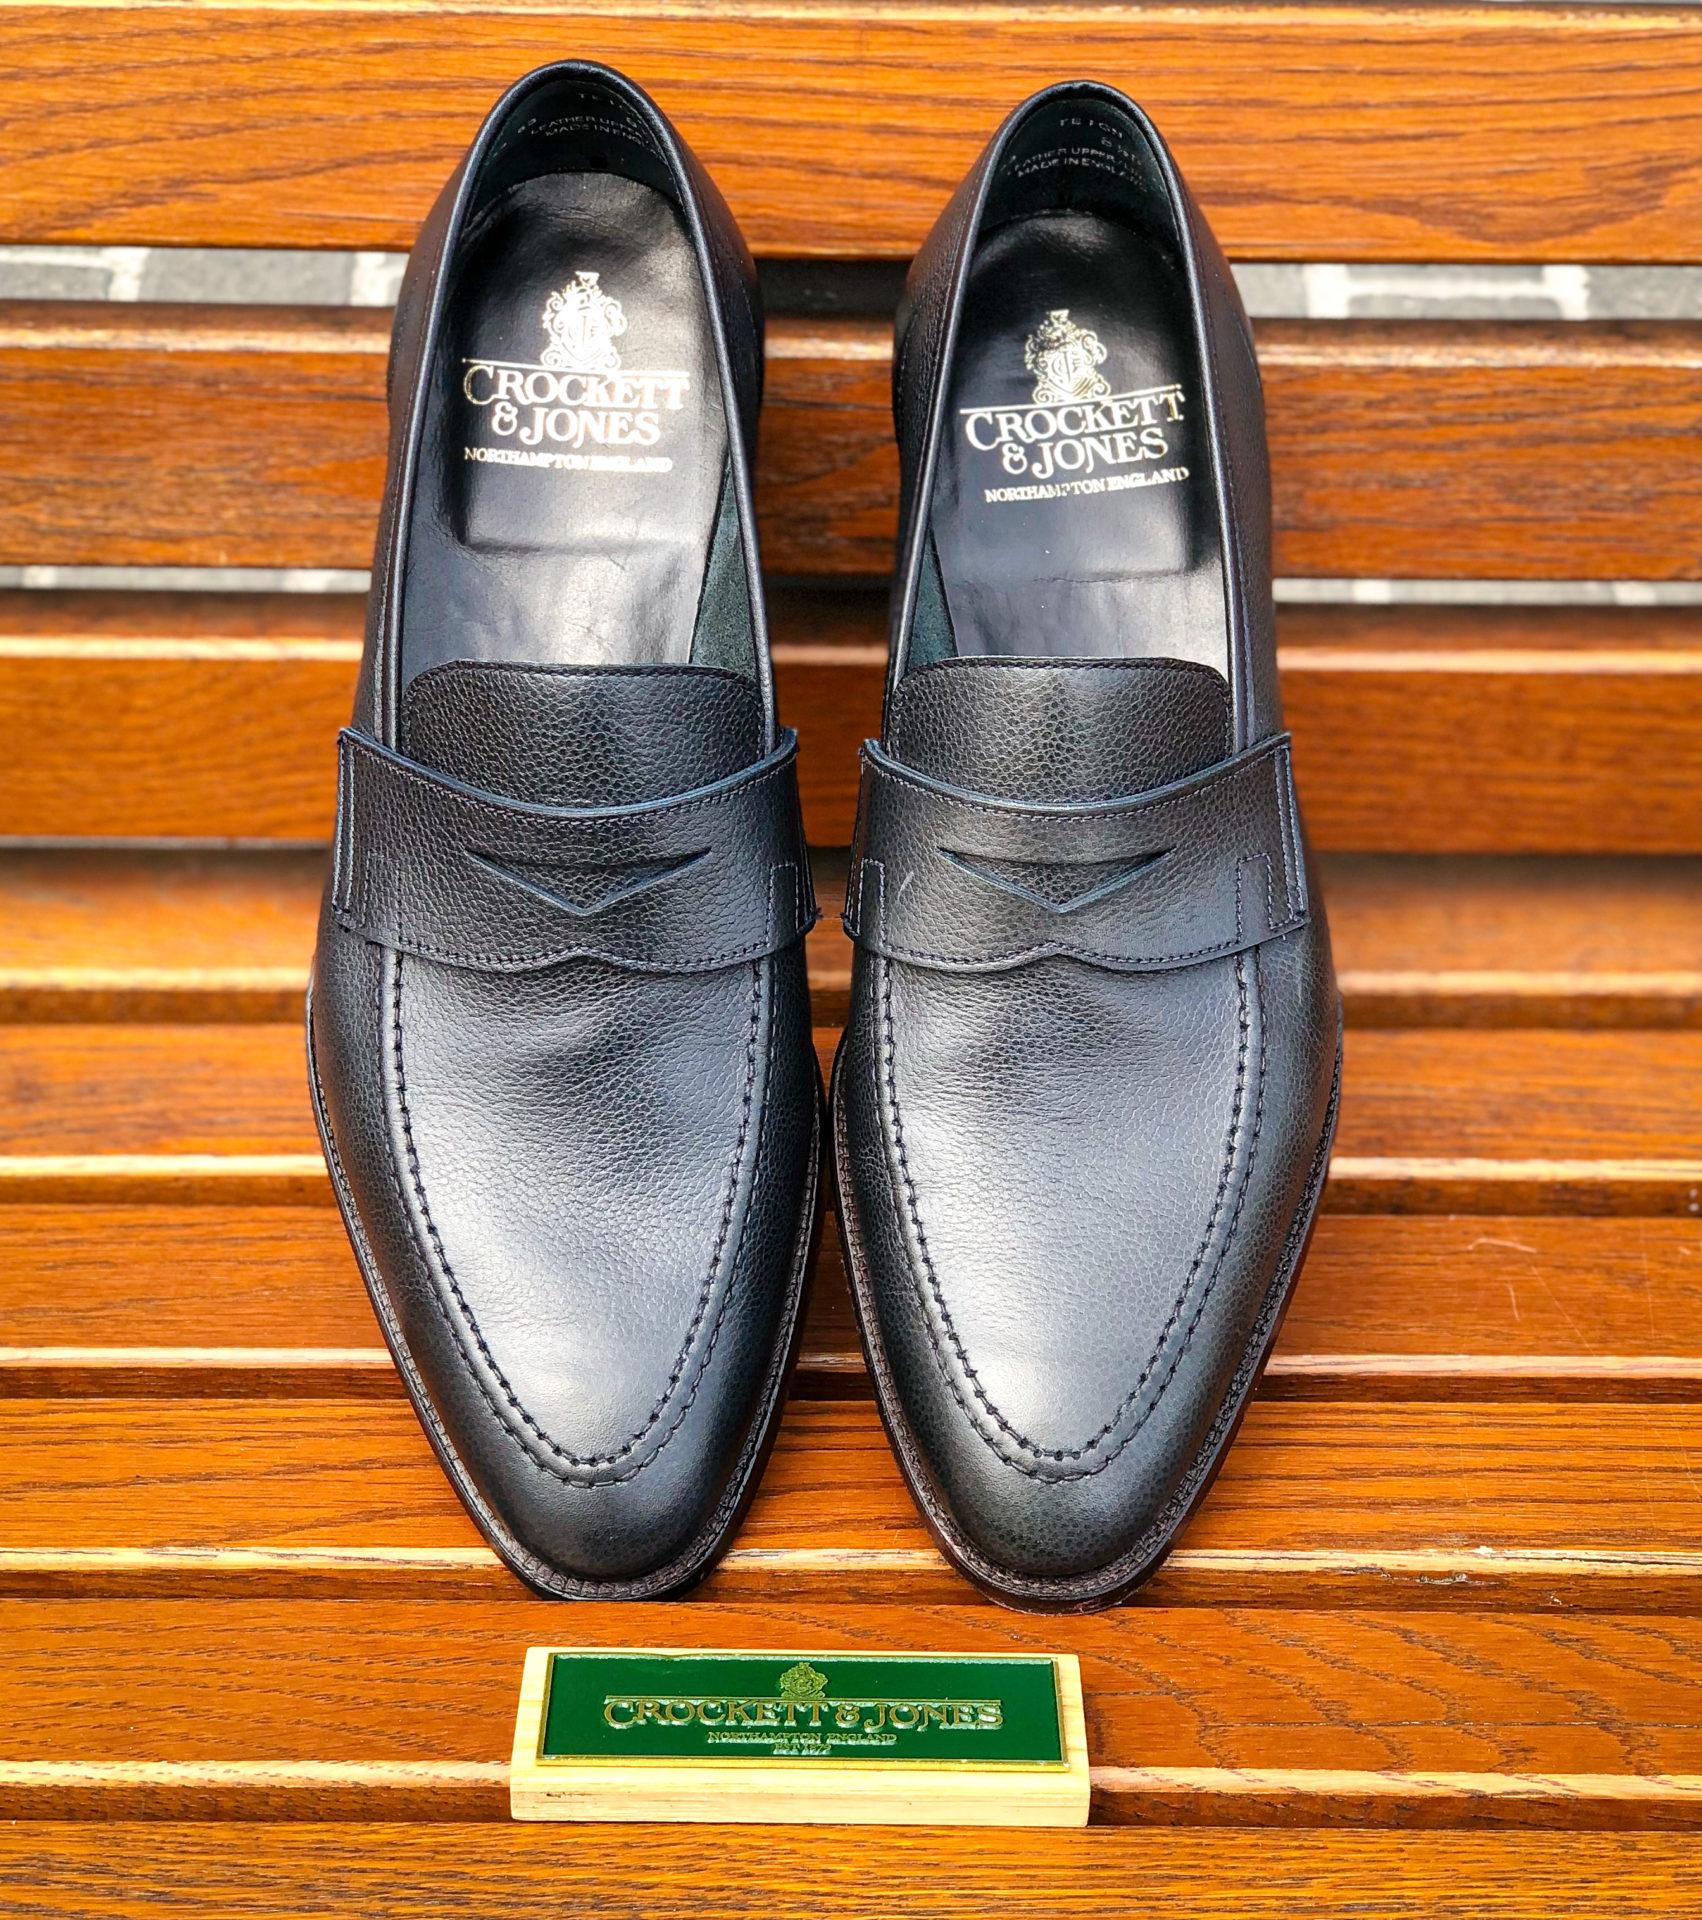 CROCKETT \u0026 JONES TEIGN • Luxury Shoes